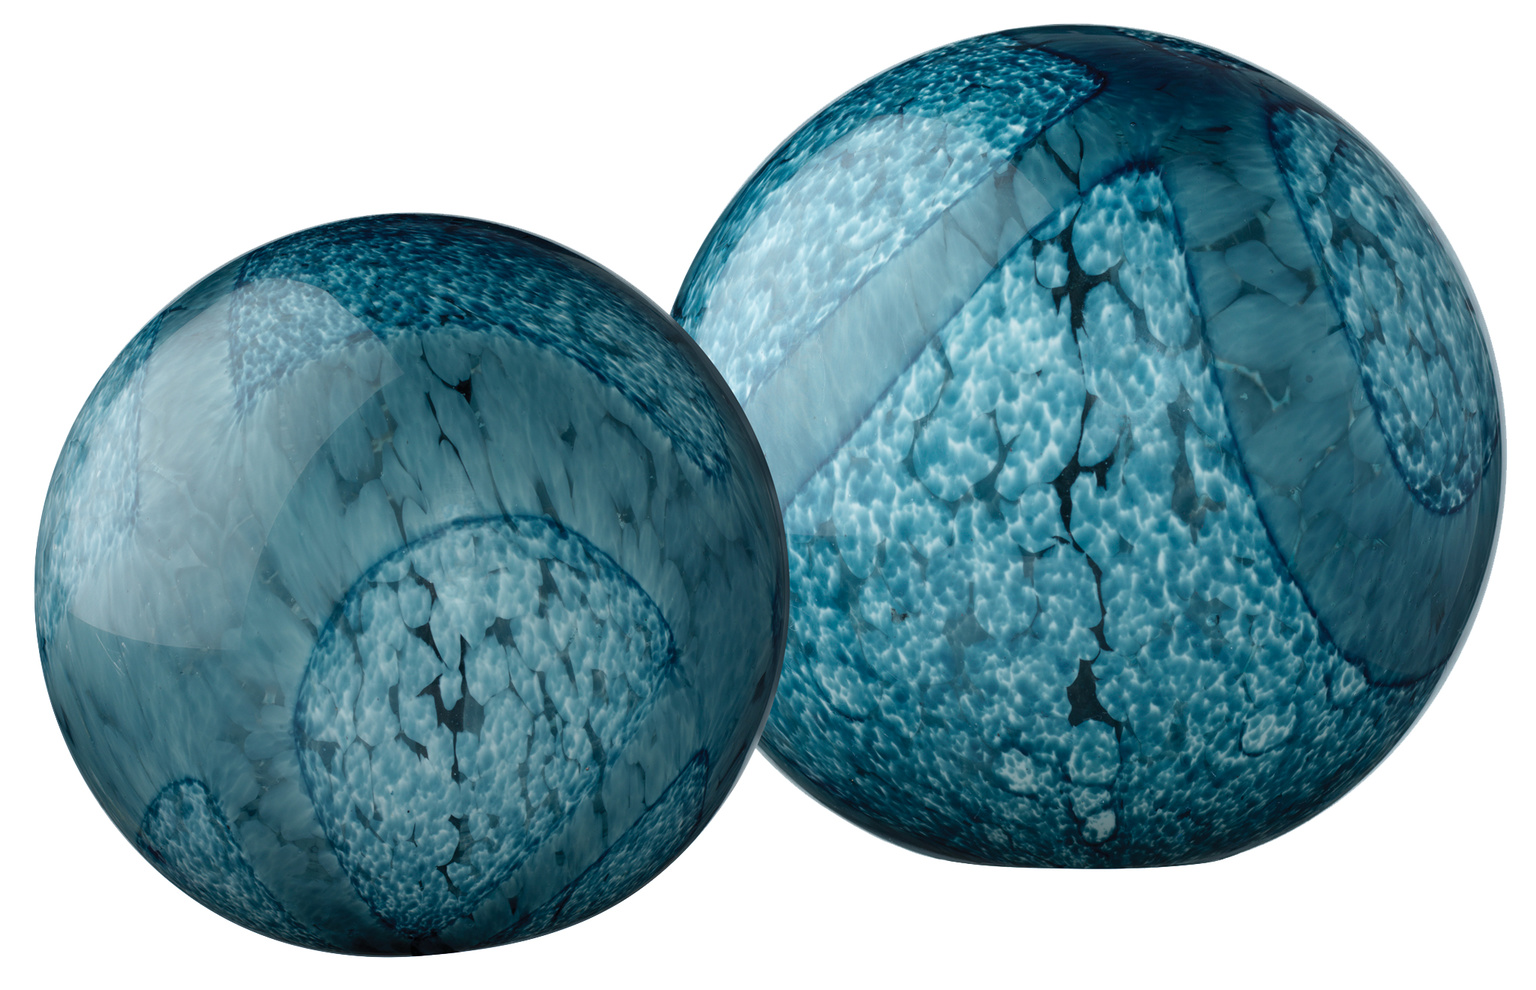 7cosm bain cosmosglassballs indigoswirlglass set%20of%202%20copy